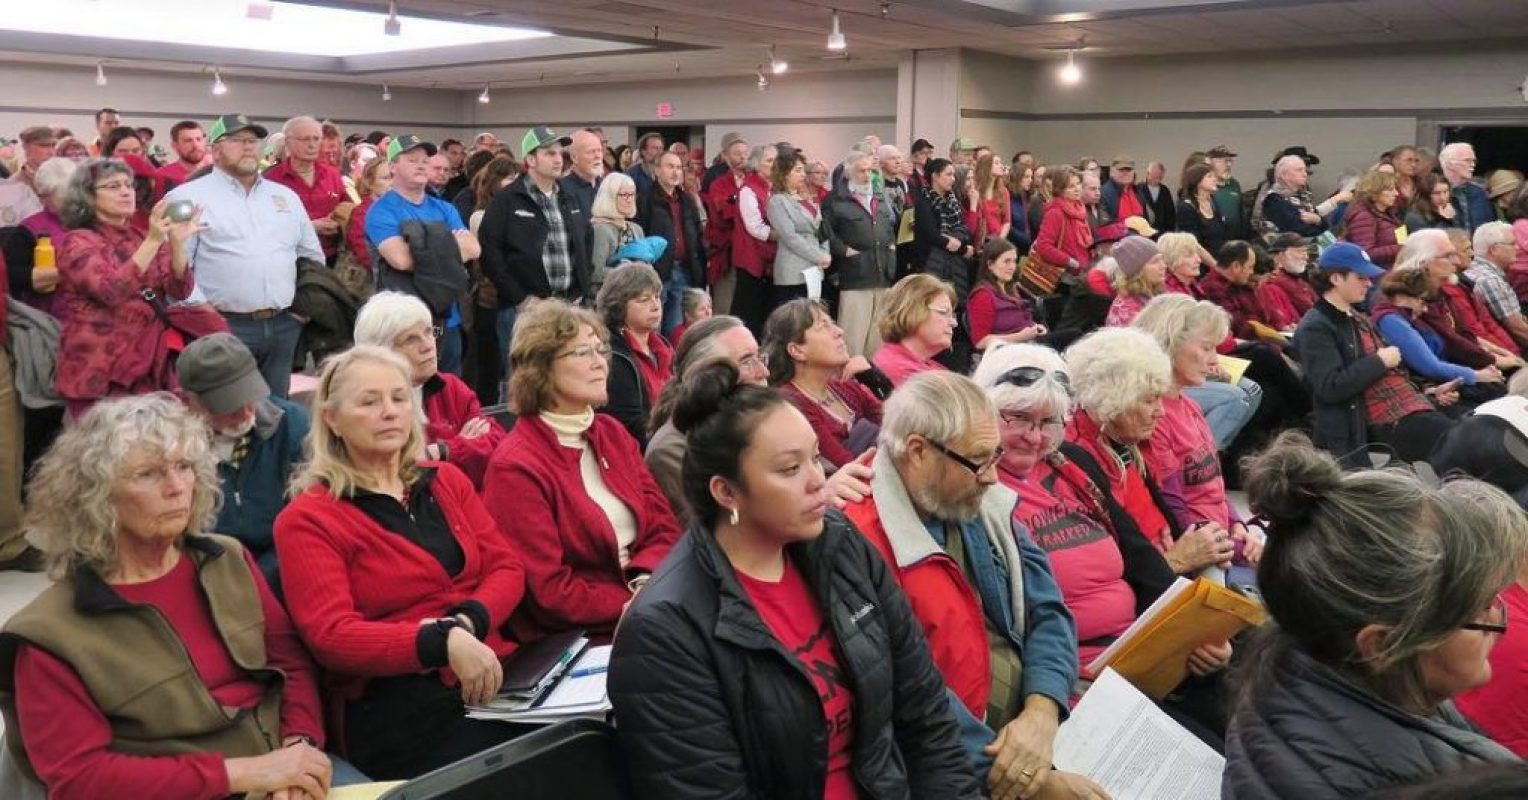 Wonderful News – Oregon Department of Environmental Quality Denies Permit to Jordan Cove Terminal / LNG Pipeline Project